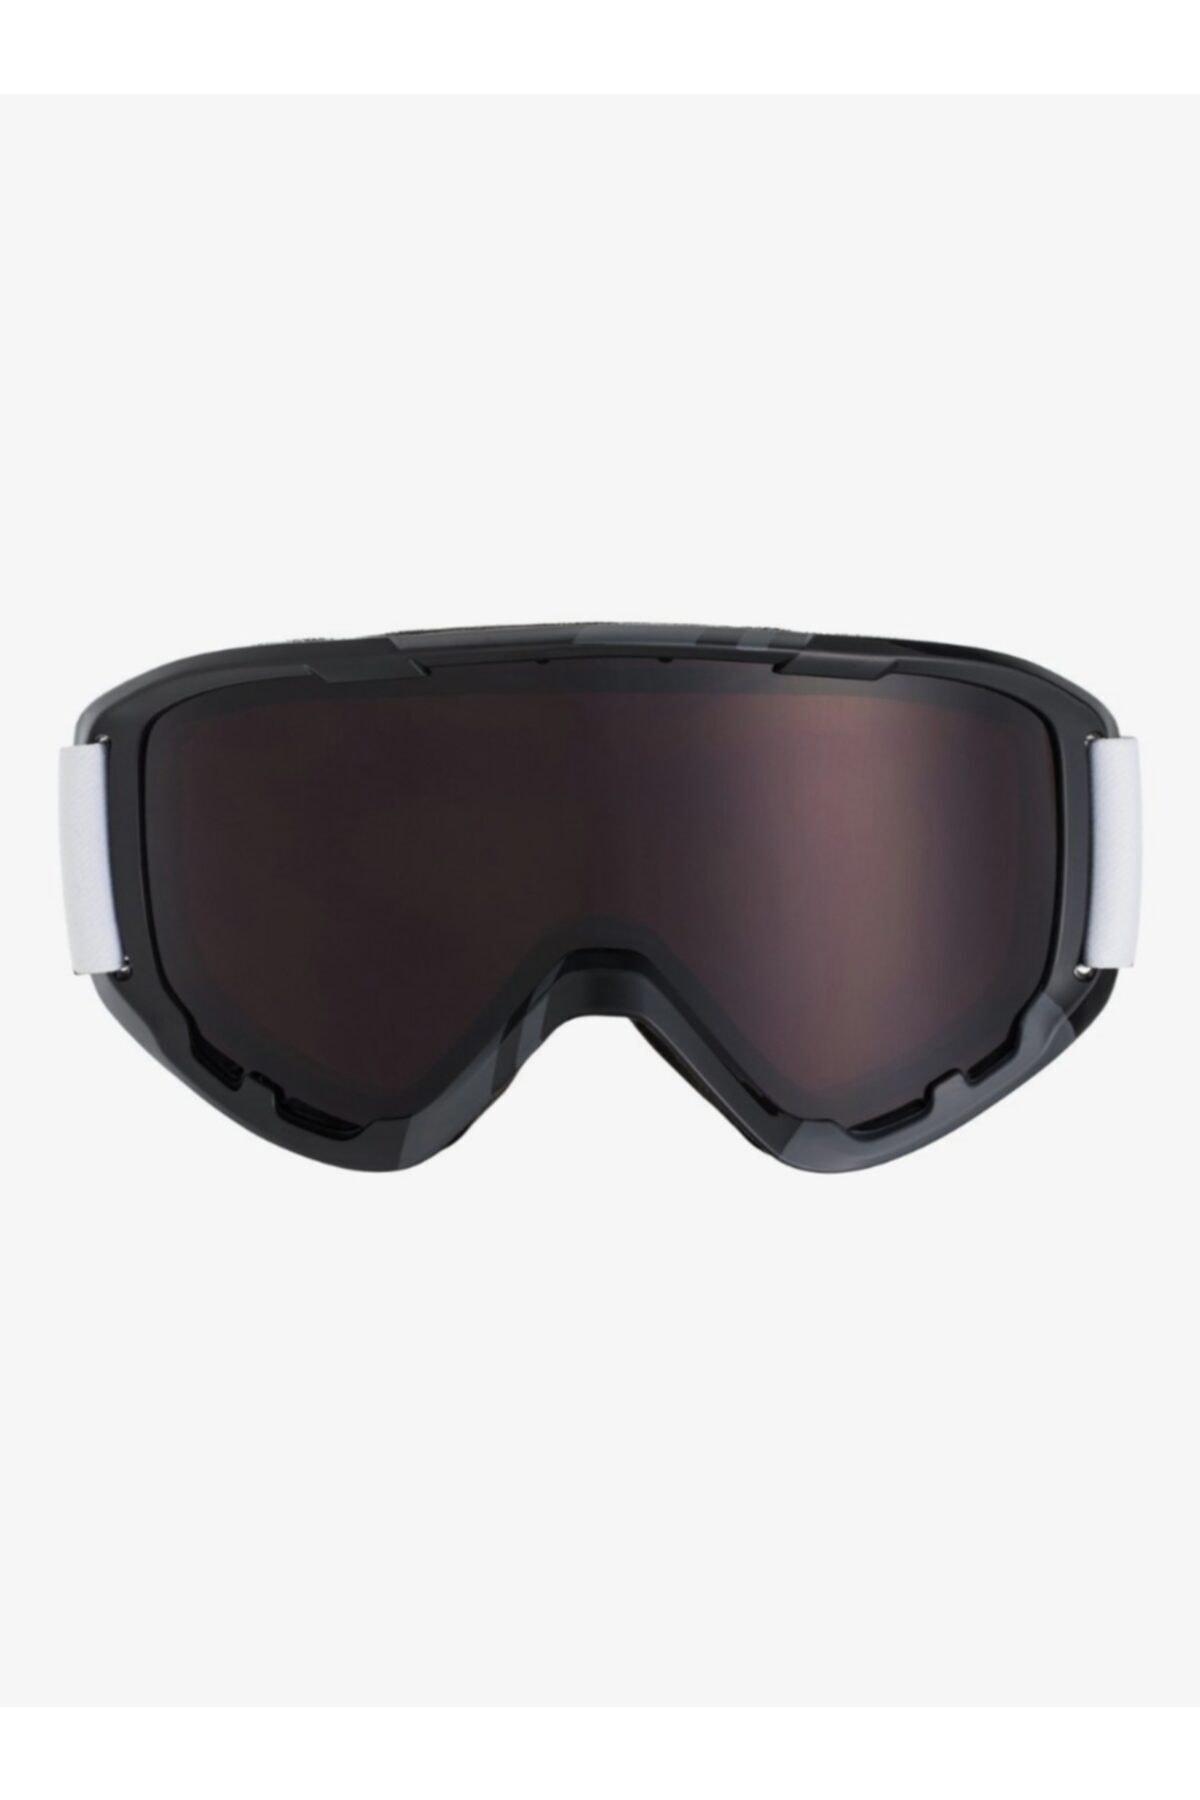 Quiksilver Unisex Siyah  Kayak Snowboard Gözlüğü Eqytg03101-kvj0 Sherpa M Sngg 2